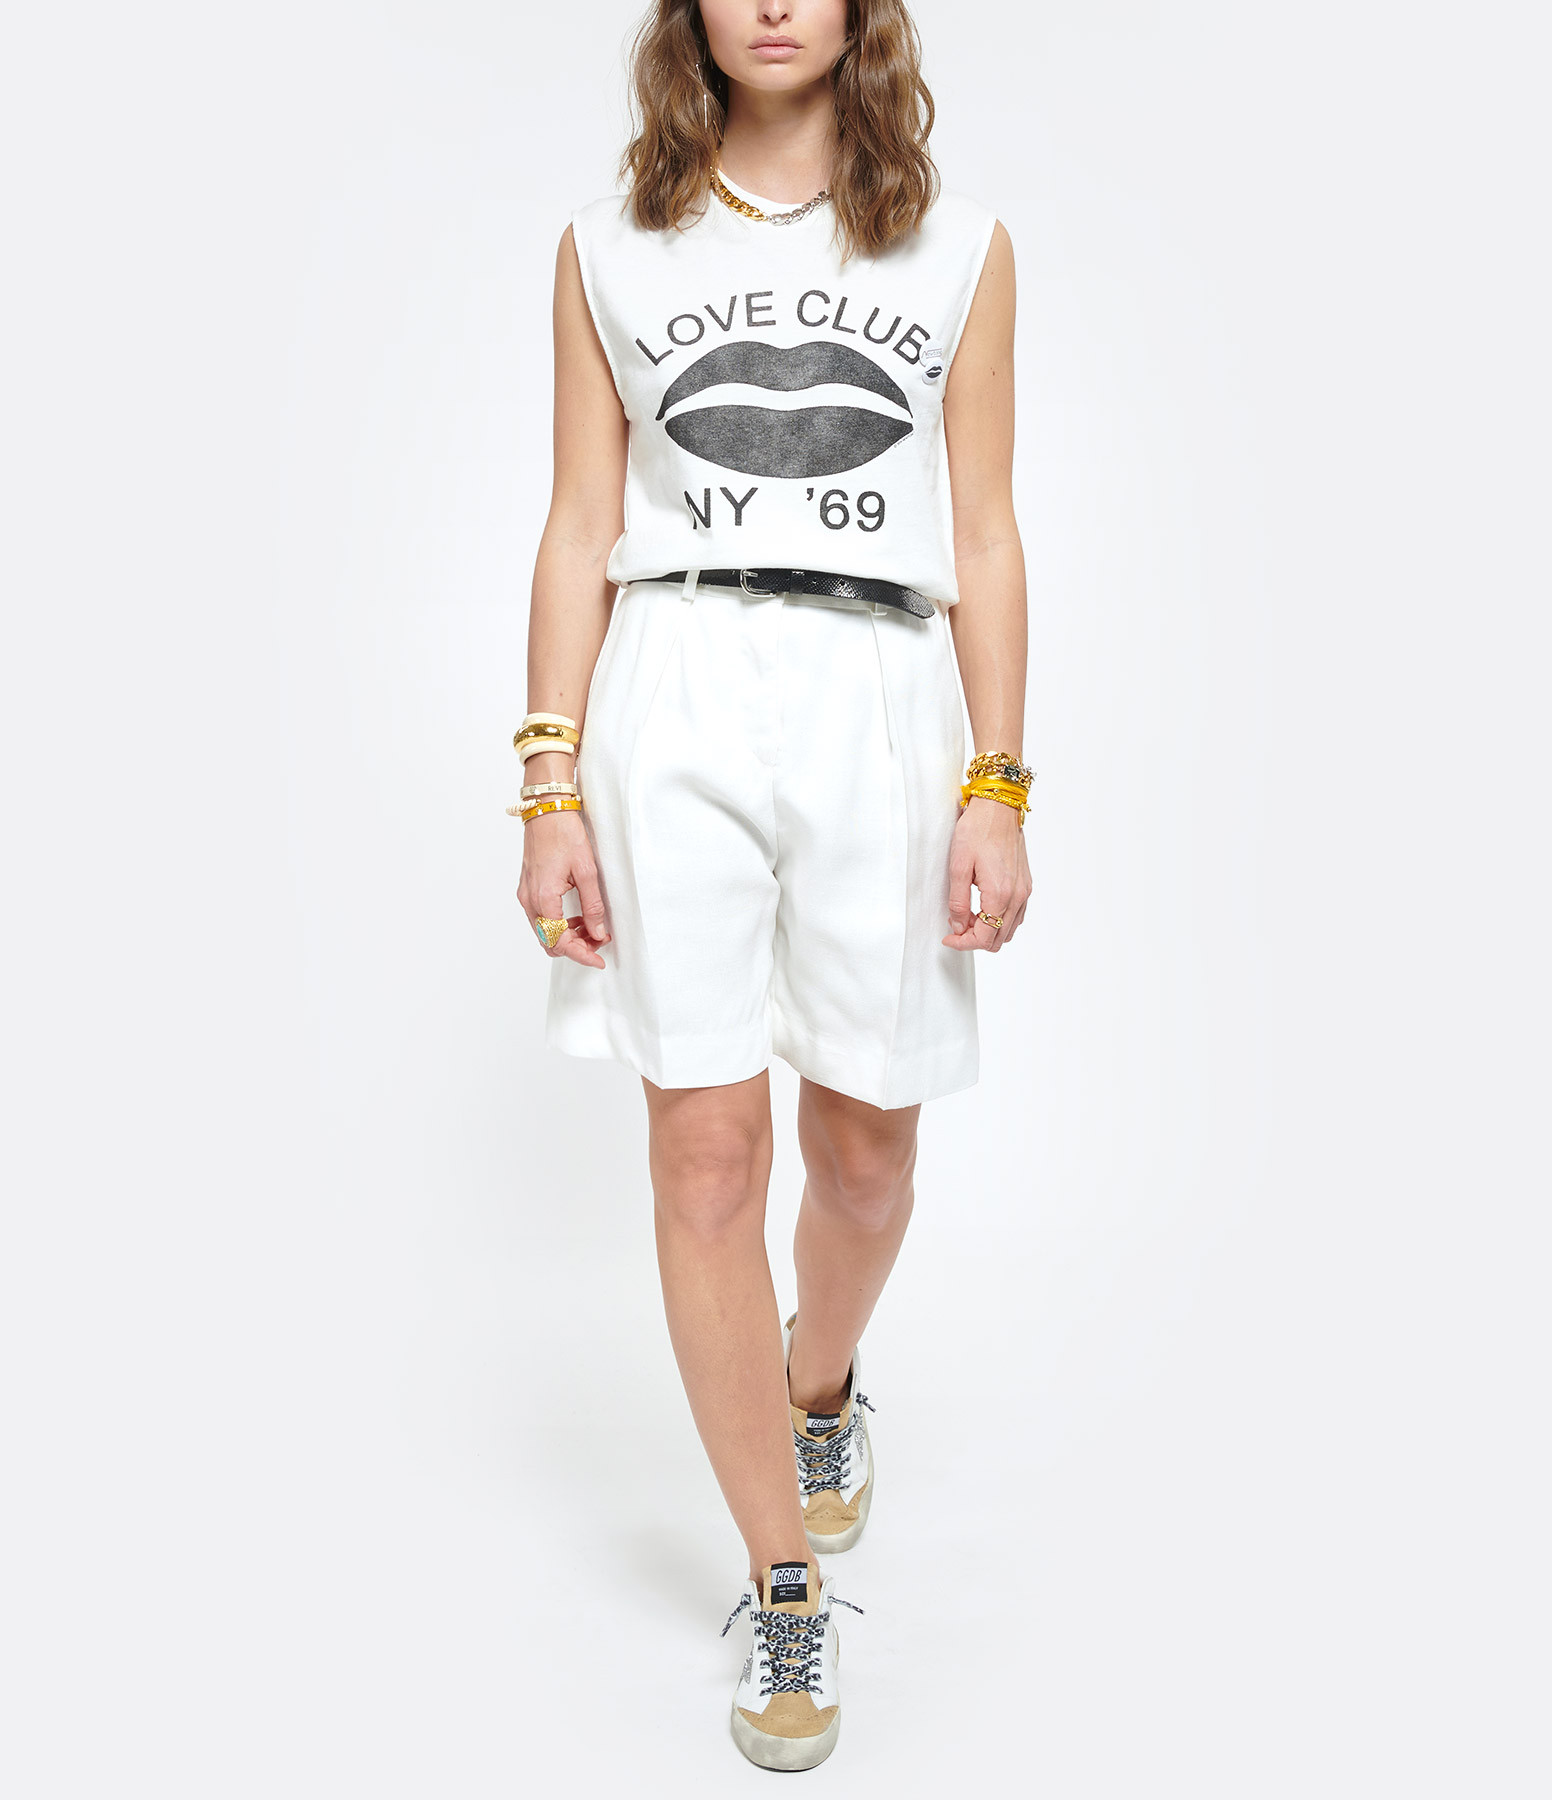 NEWTONE - Tee-shirt Biker Love Club Coton Blanc